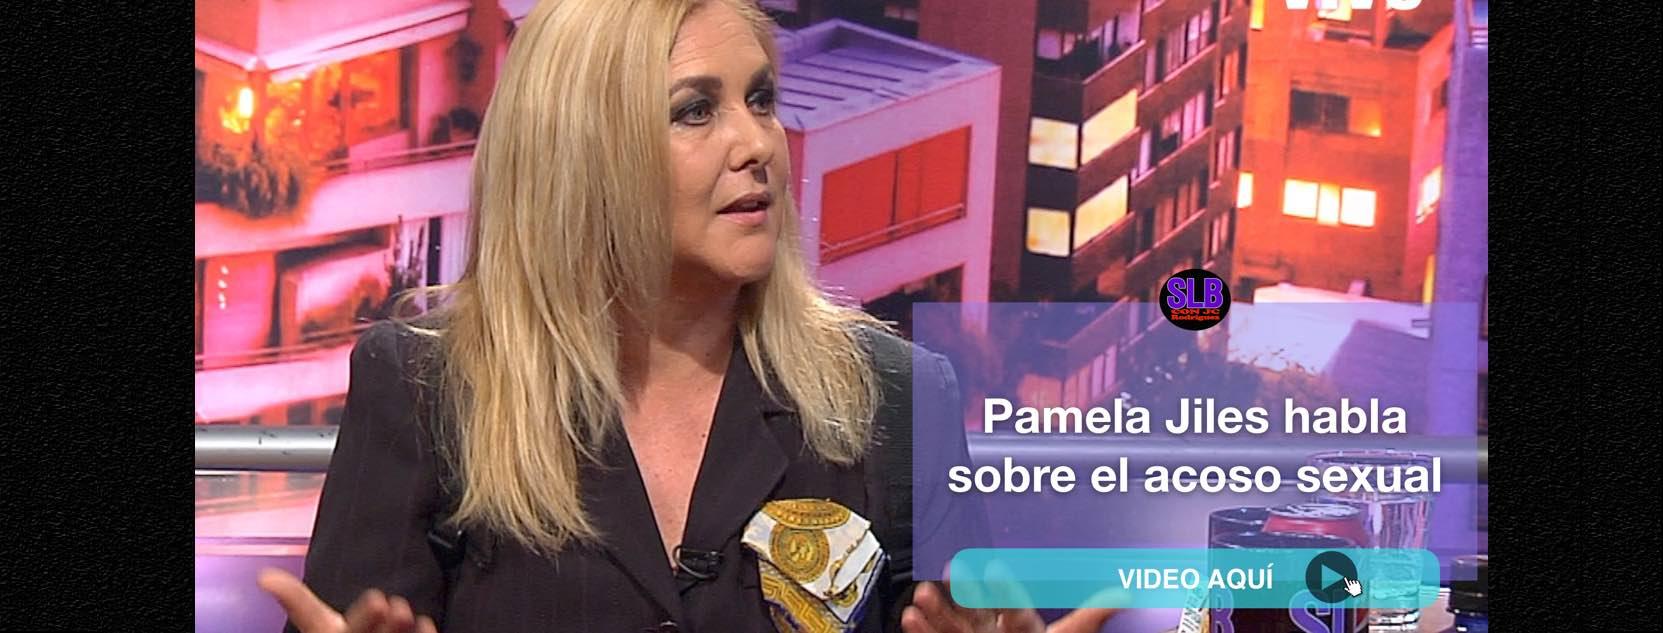 pamela-jiles-7nov